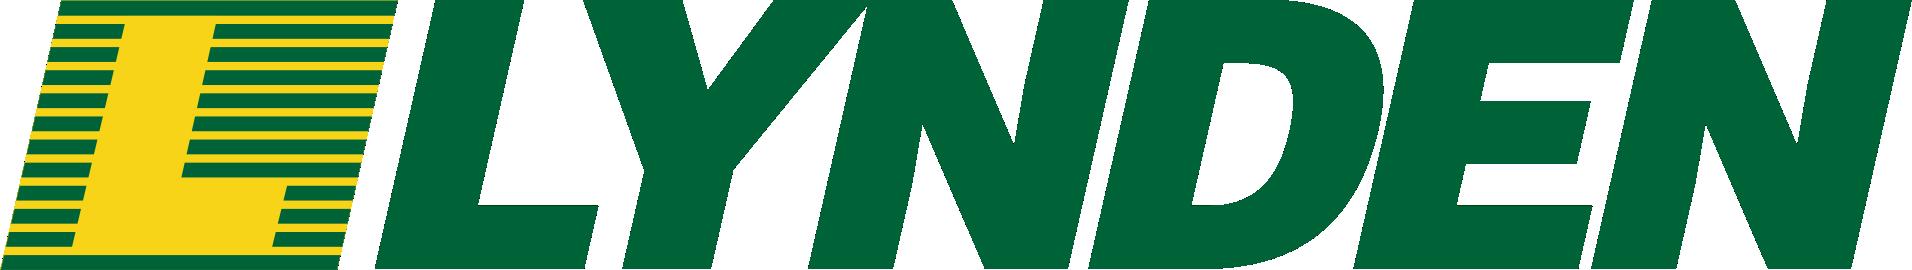 Top Drive Sponsors - $1,000 - Lynden - Logo